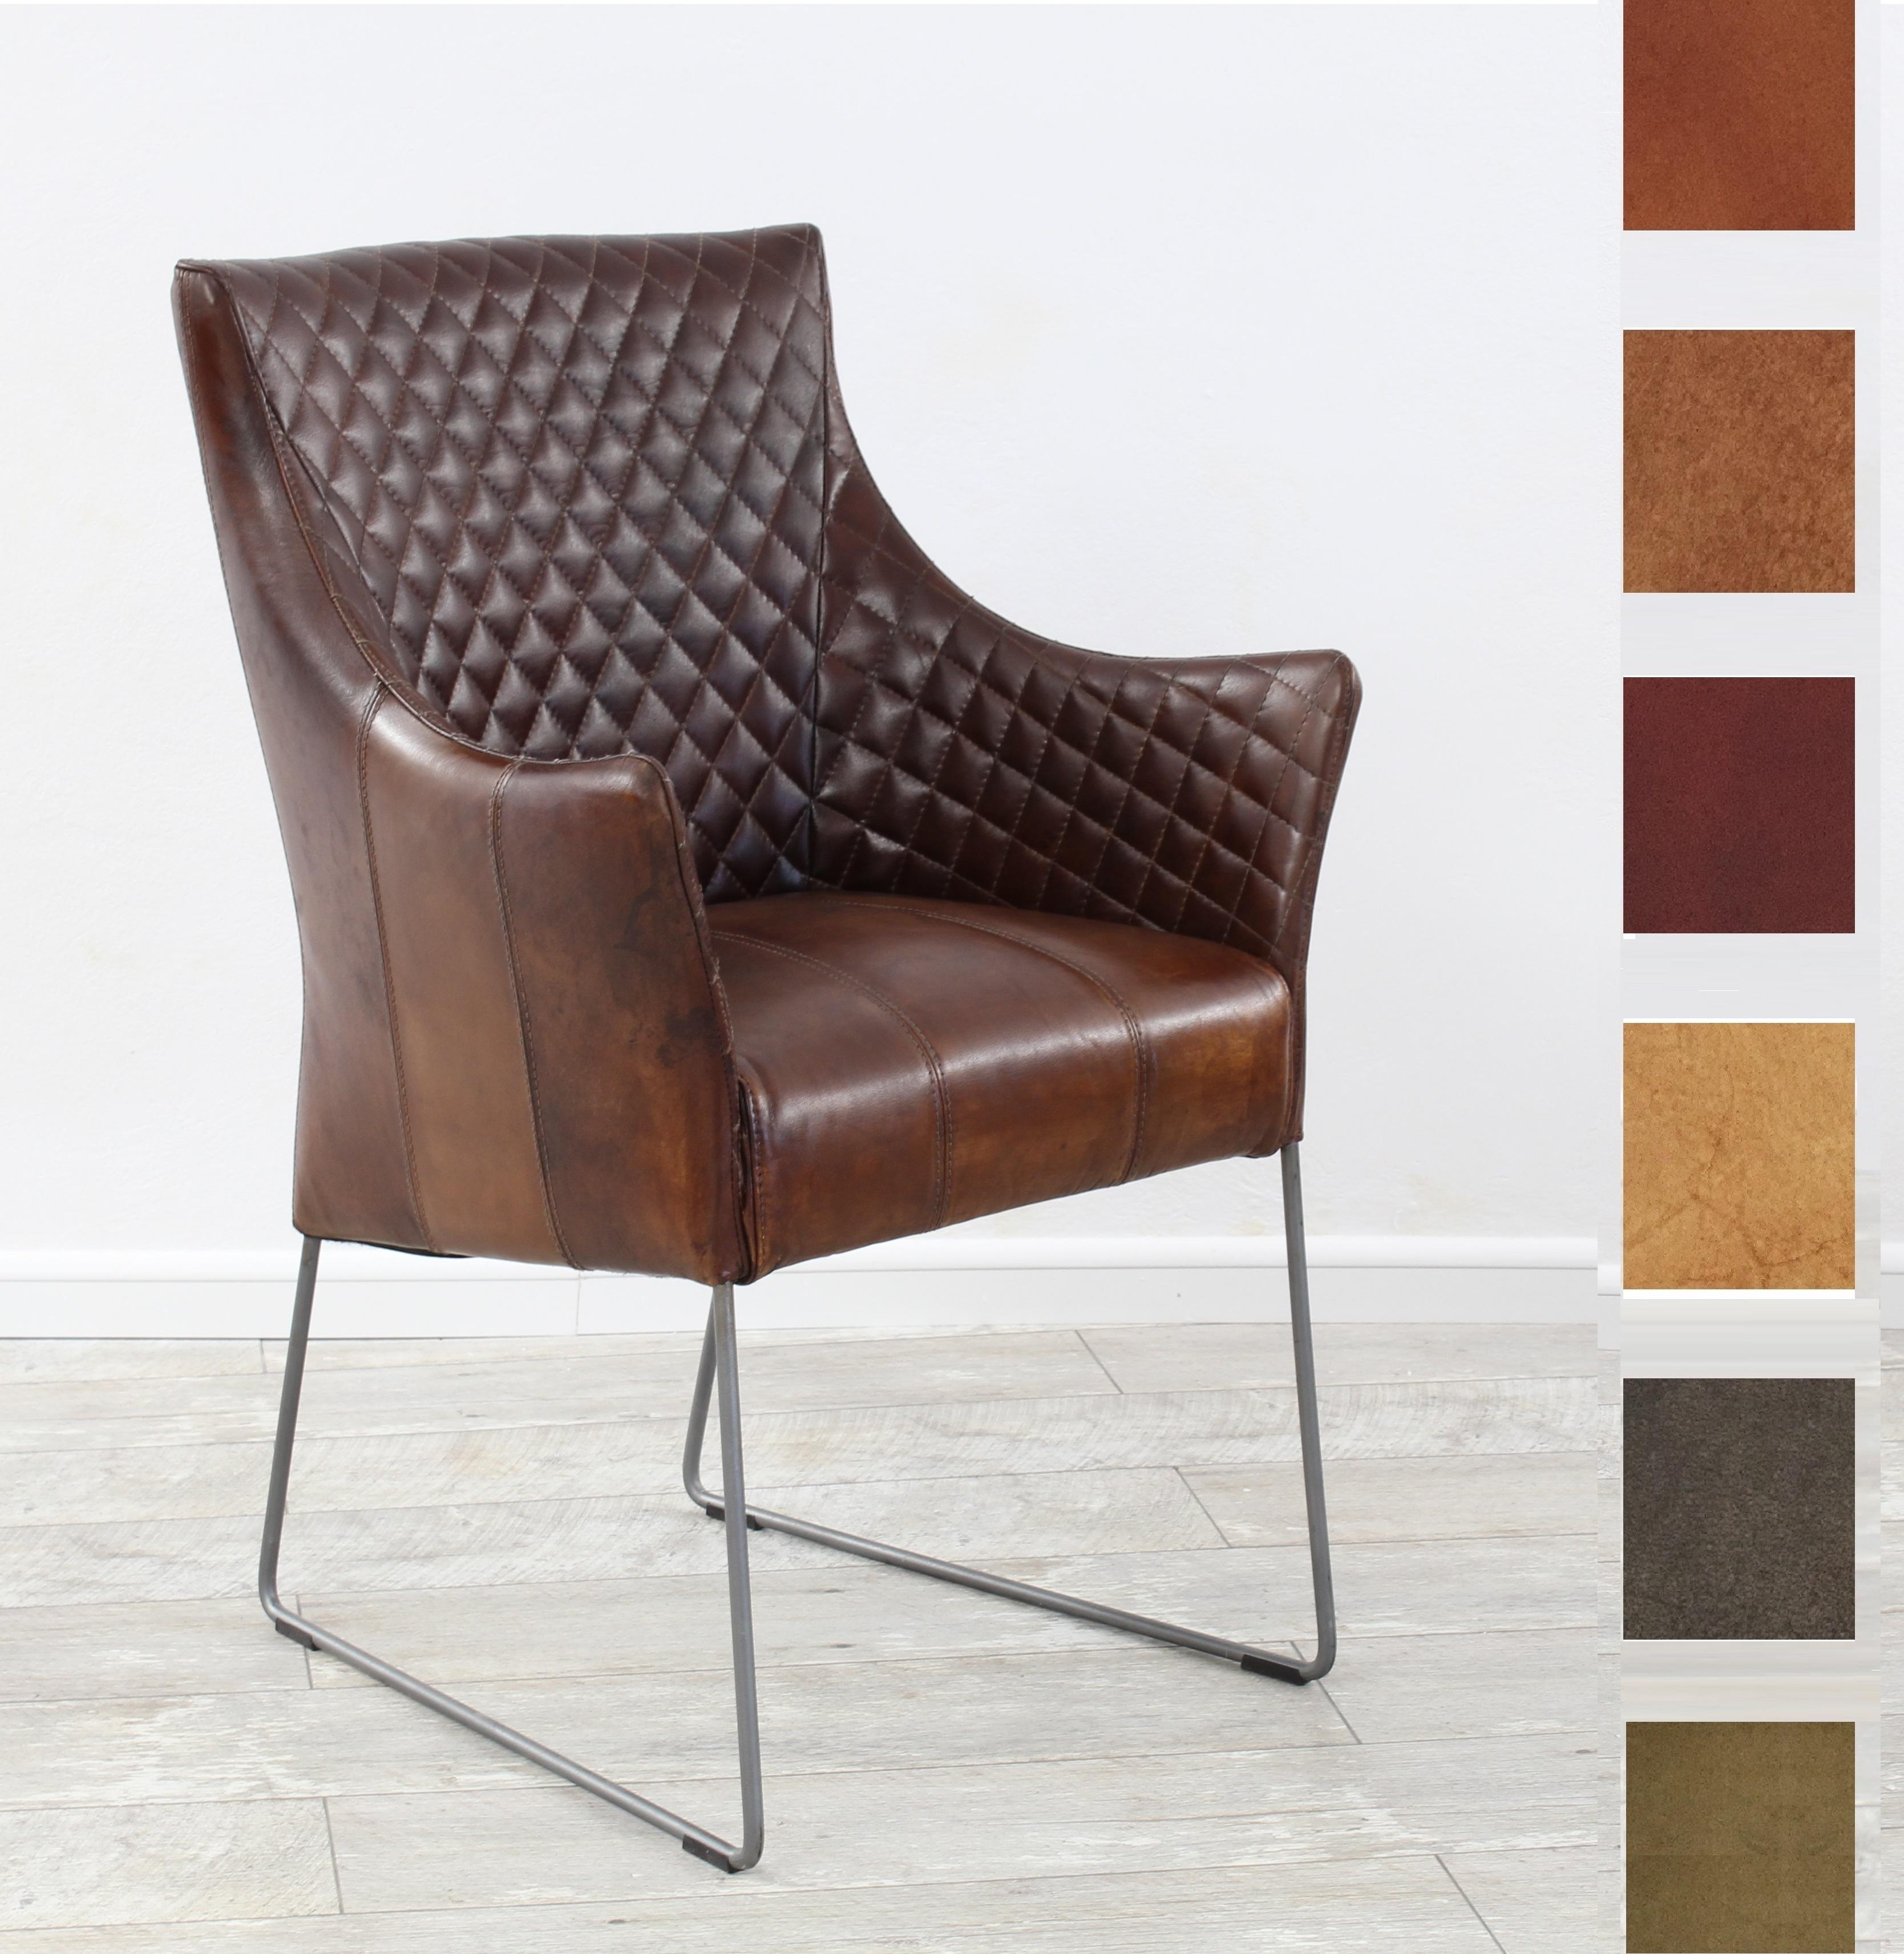 Aktiv Moebel De Stuhl Sessel Designer Frankfurt Echt